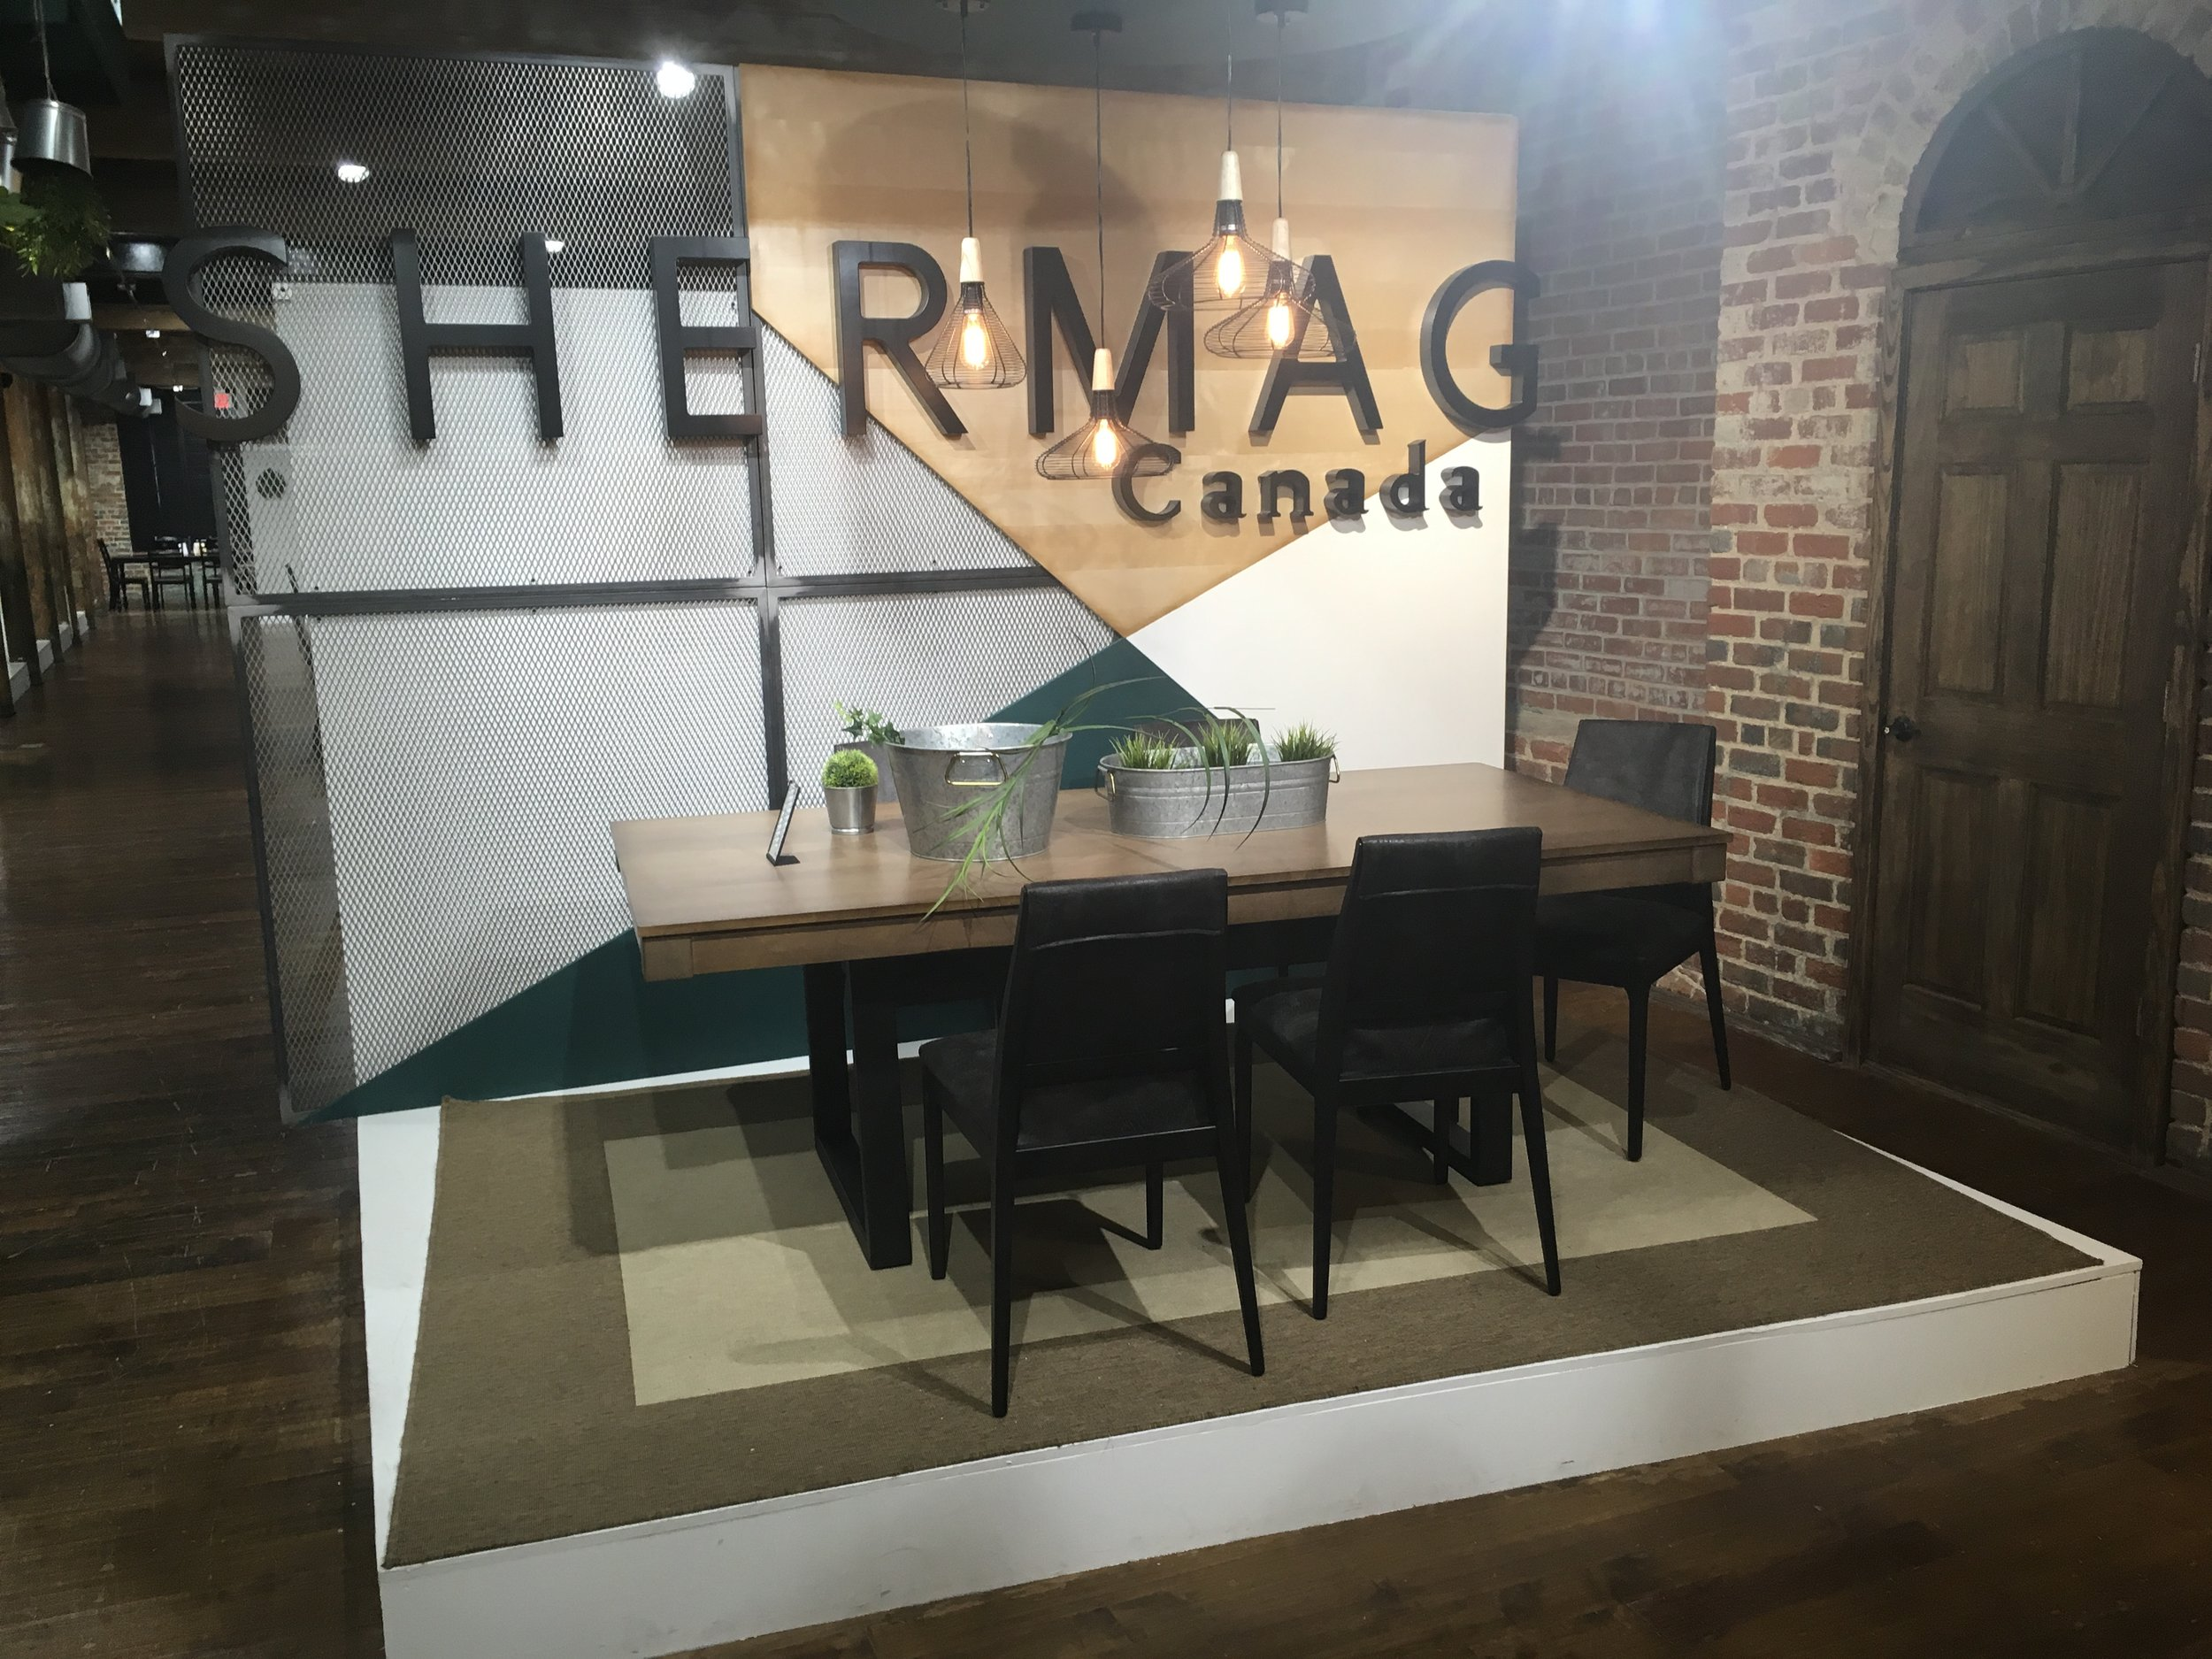 Shermag Canada Showroom